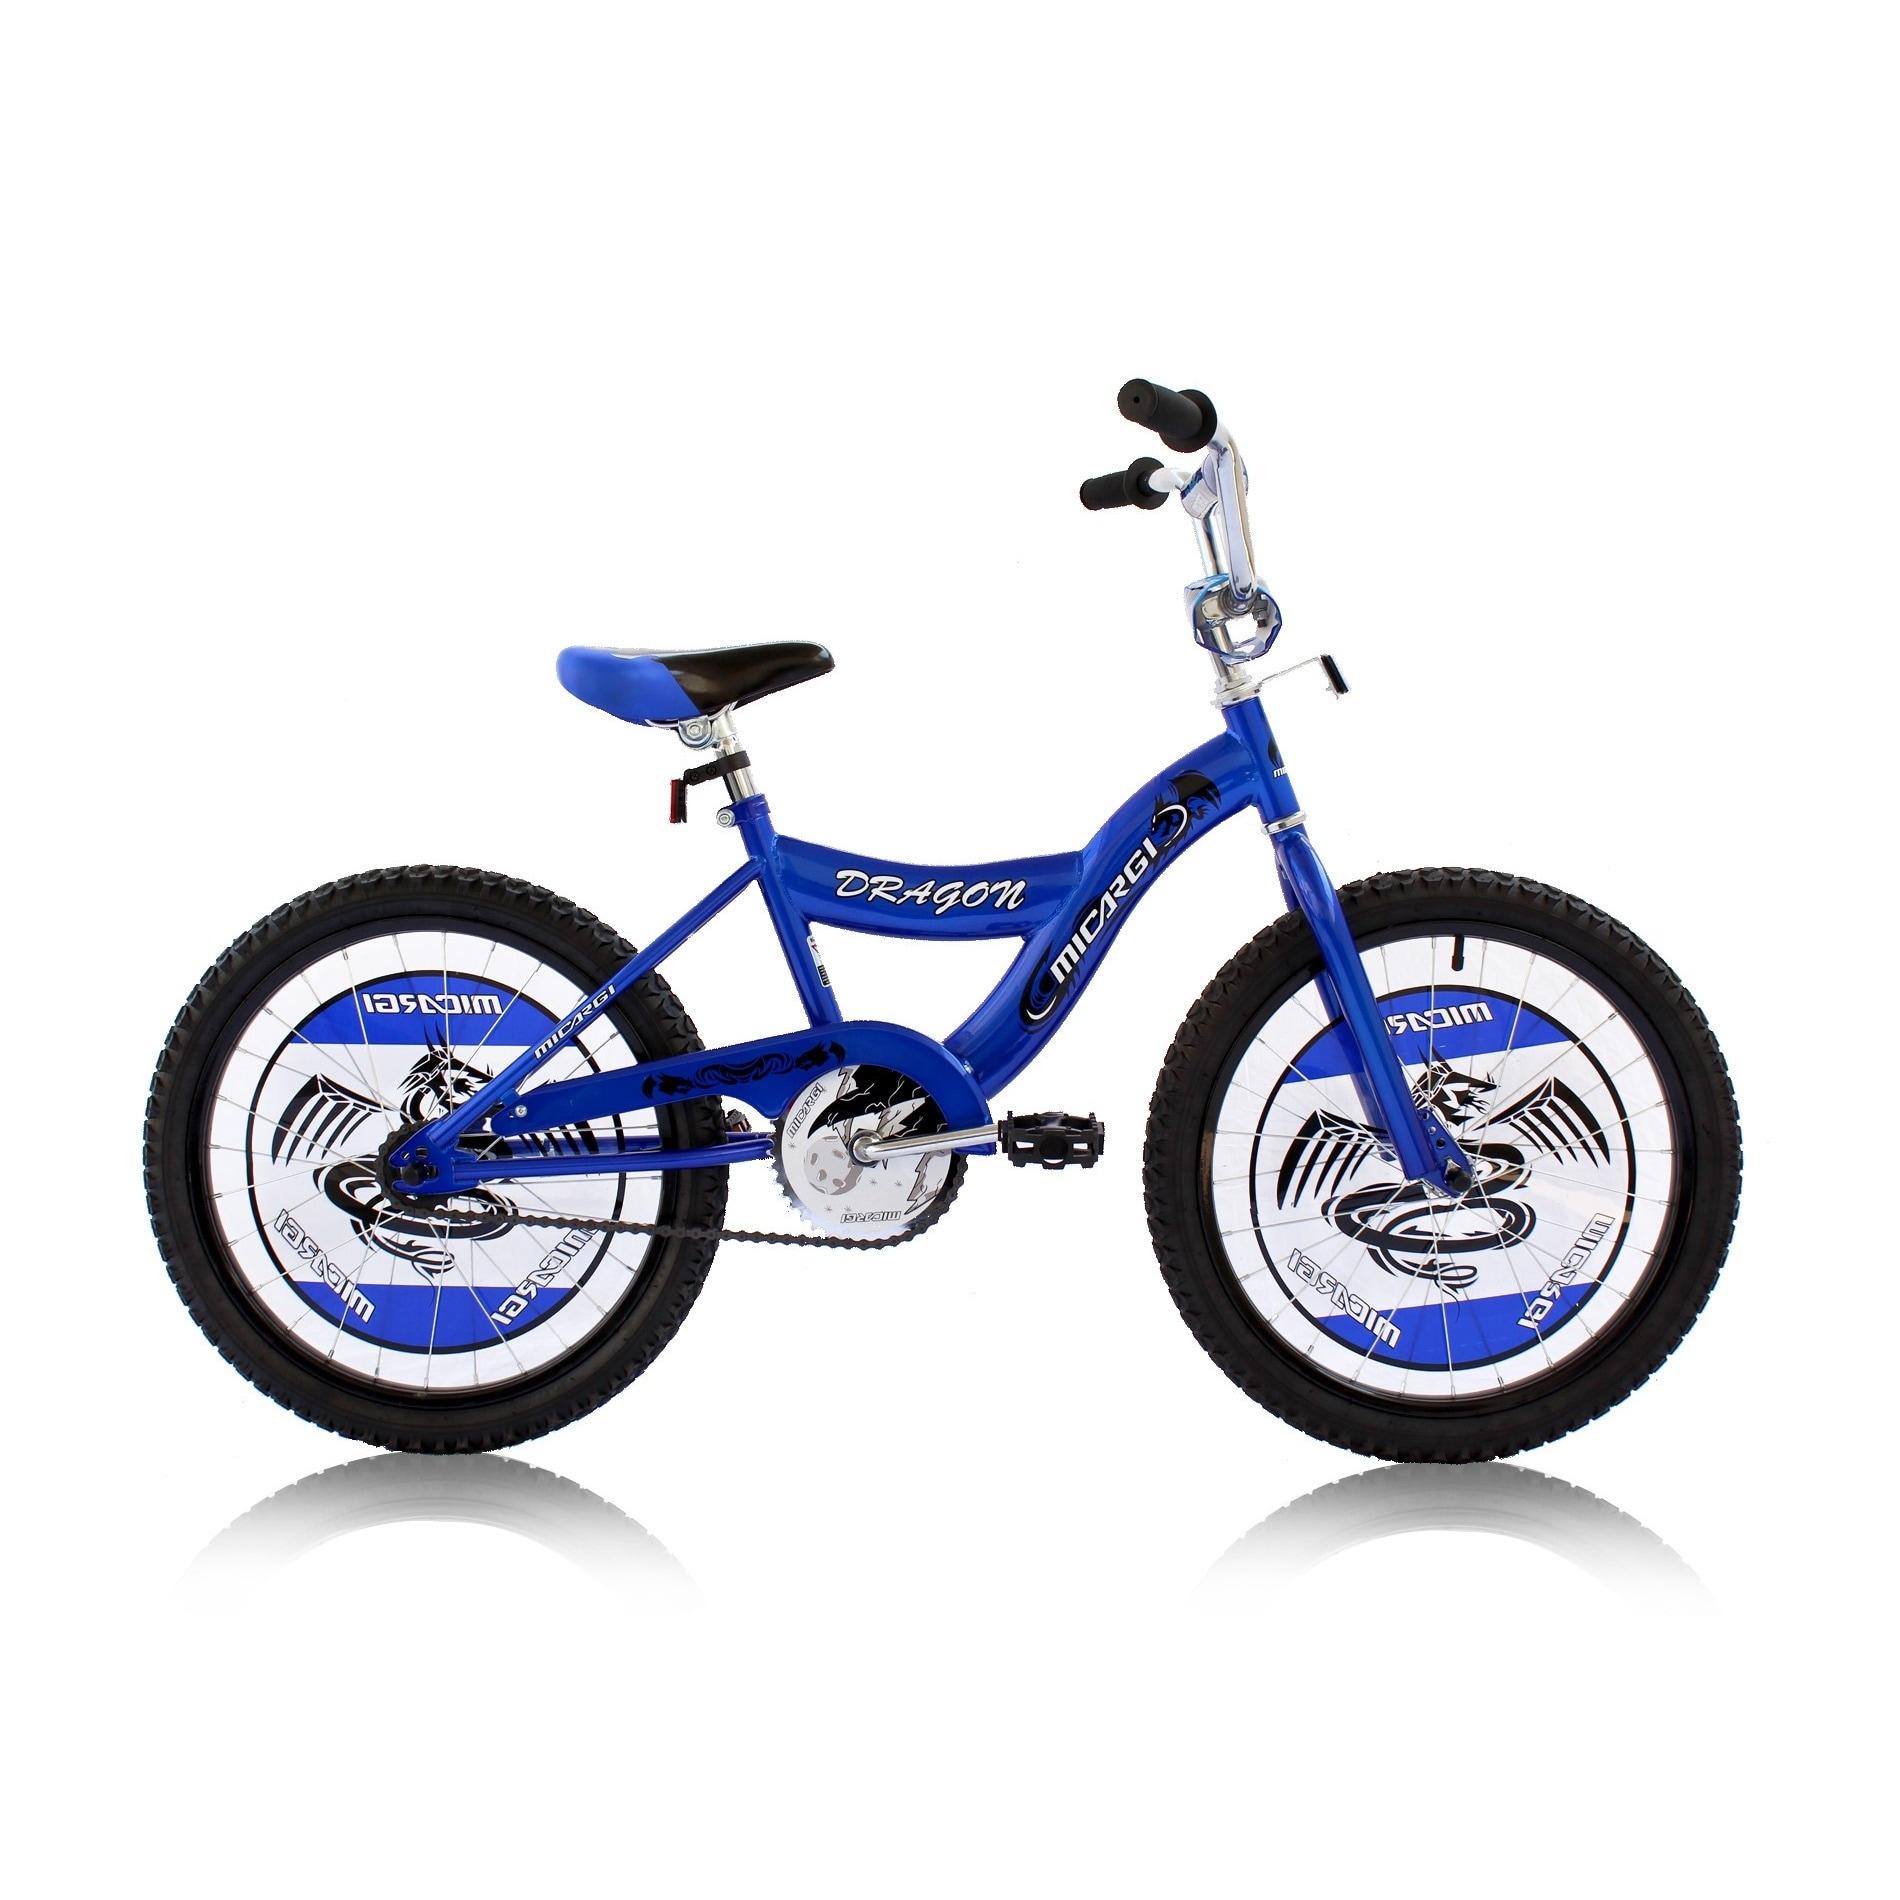 Micargi Boys Blue 20-inch BMX Bicycle Dragon (Dragon-B-Blue)